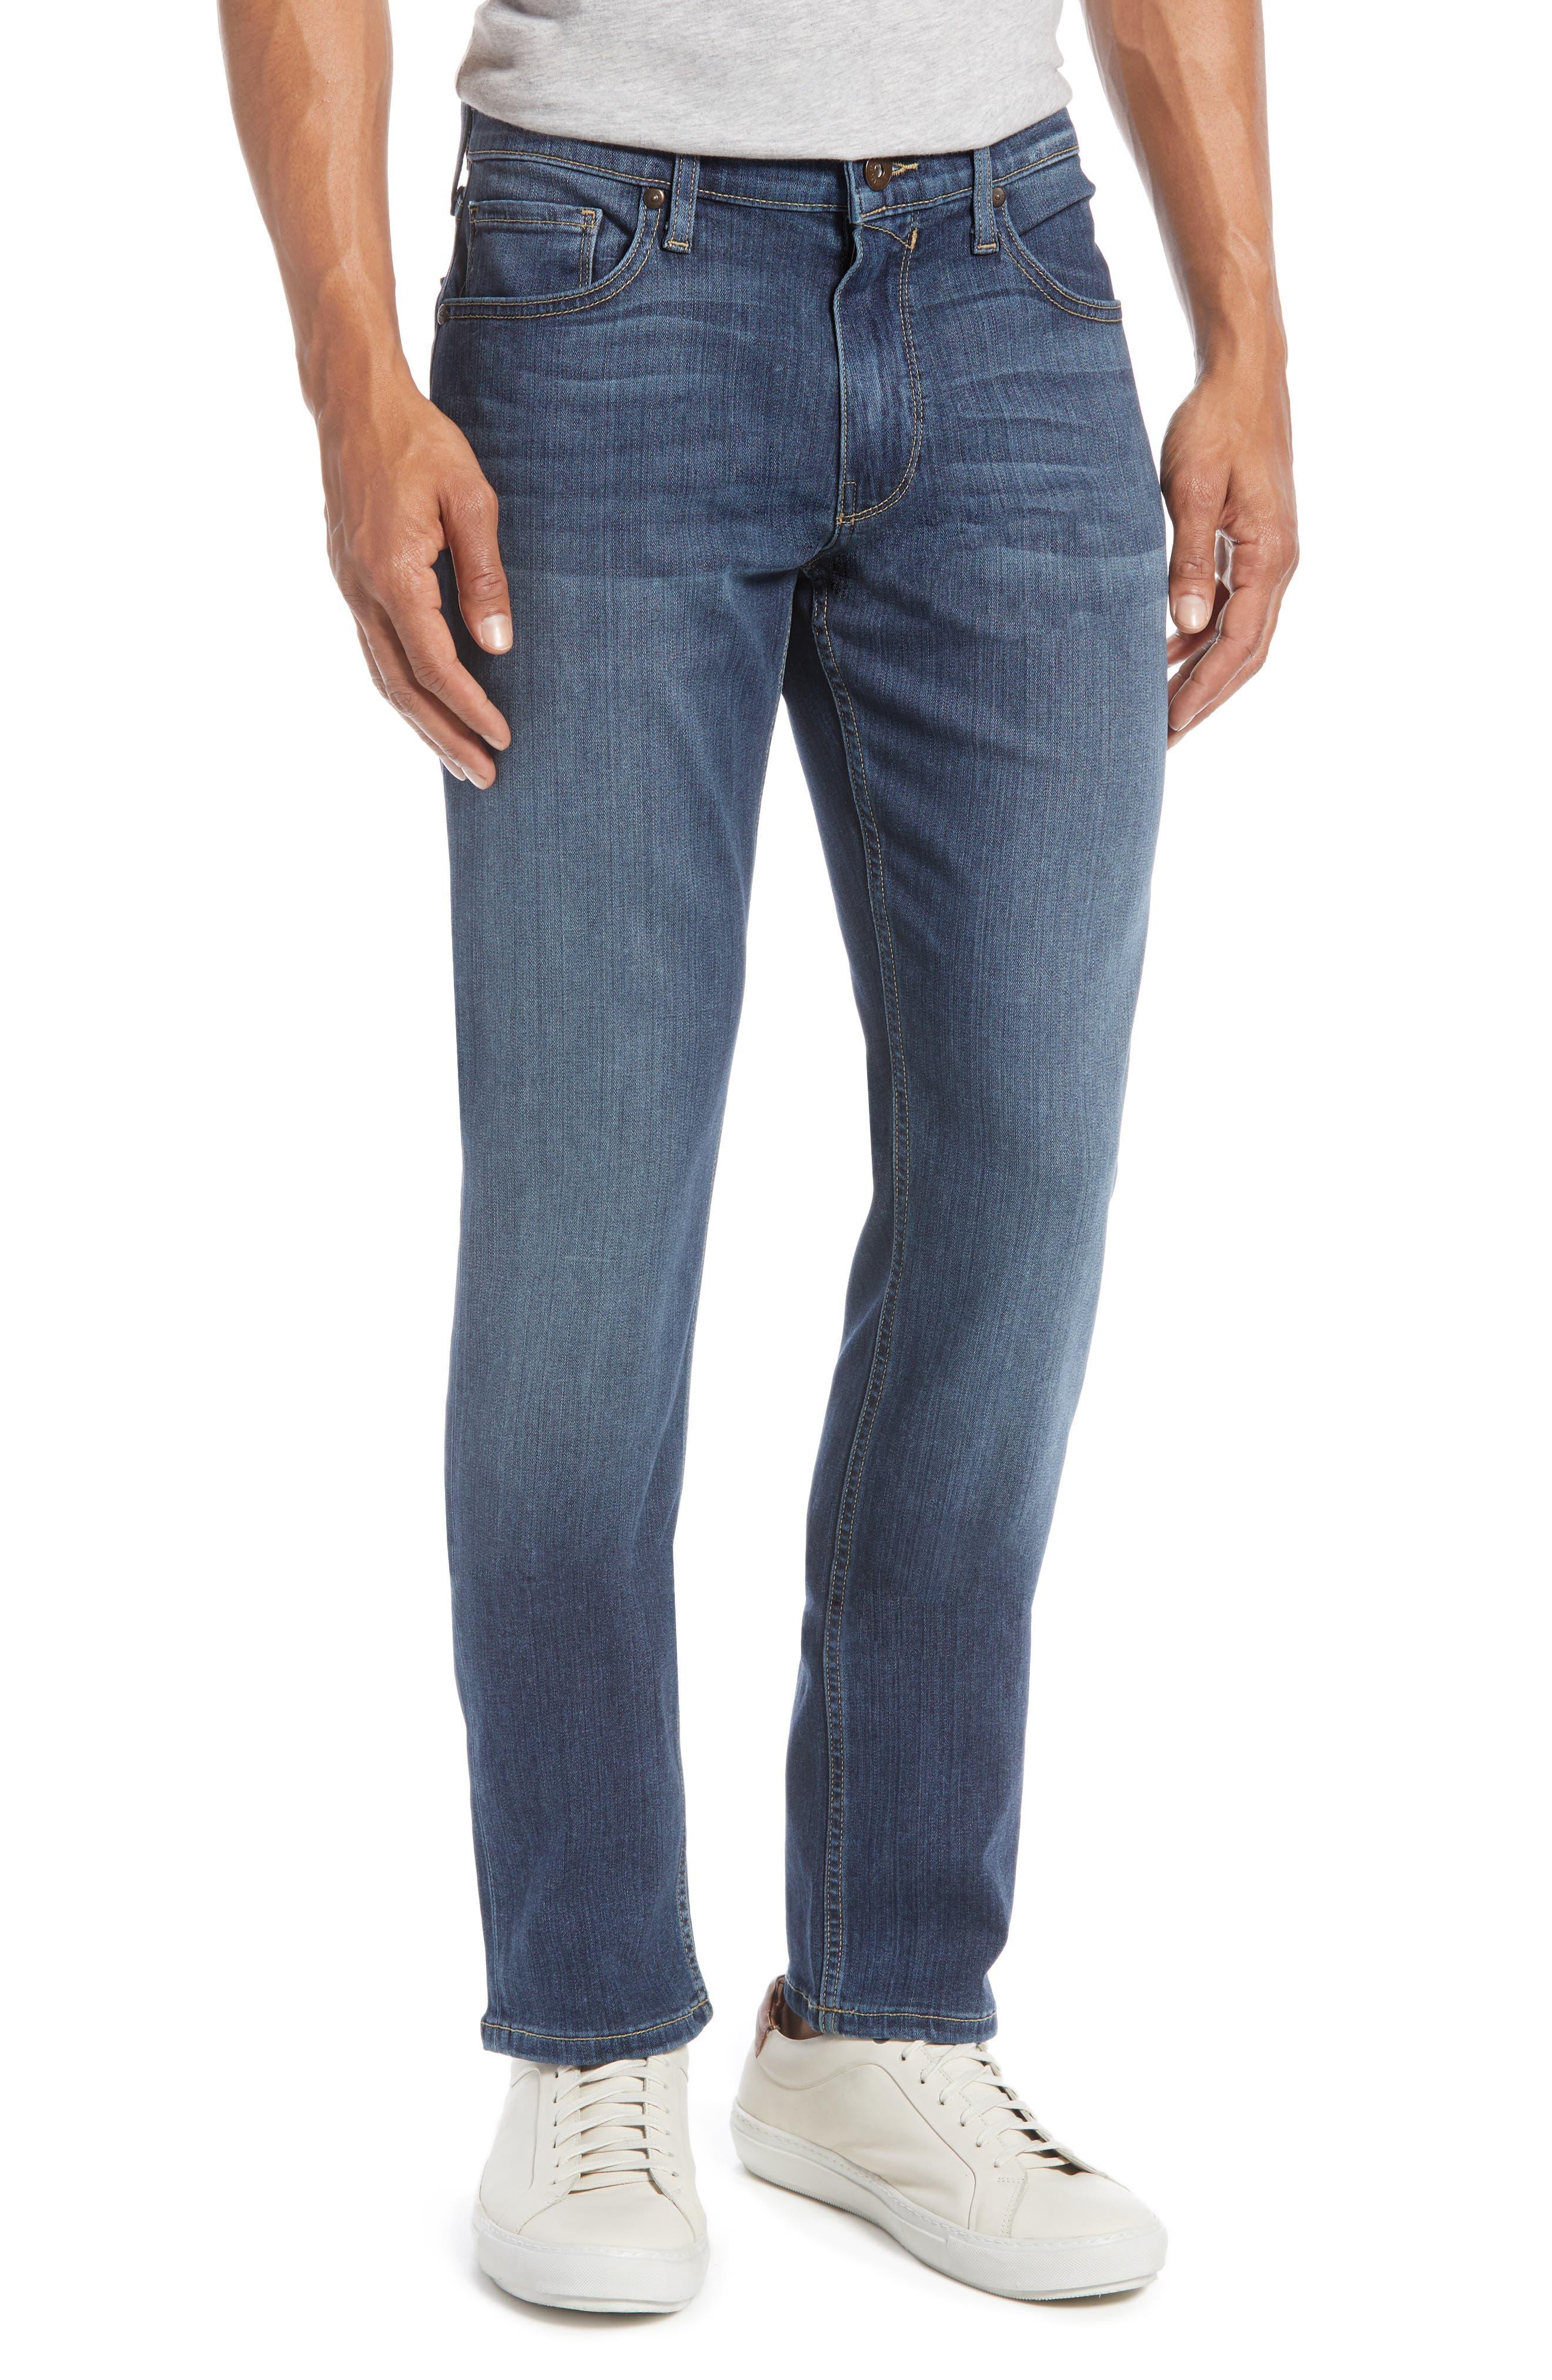 PAIGE, Transcend - Federal Slim Straight Leg Jeans, Alternate thumbnail 2, color, BIRCH